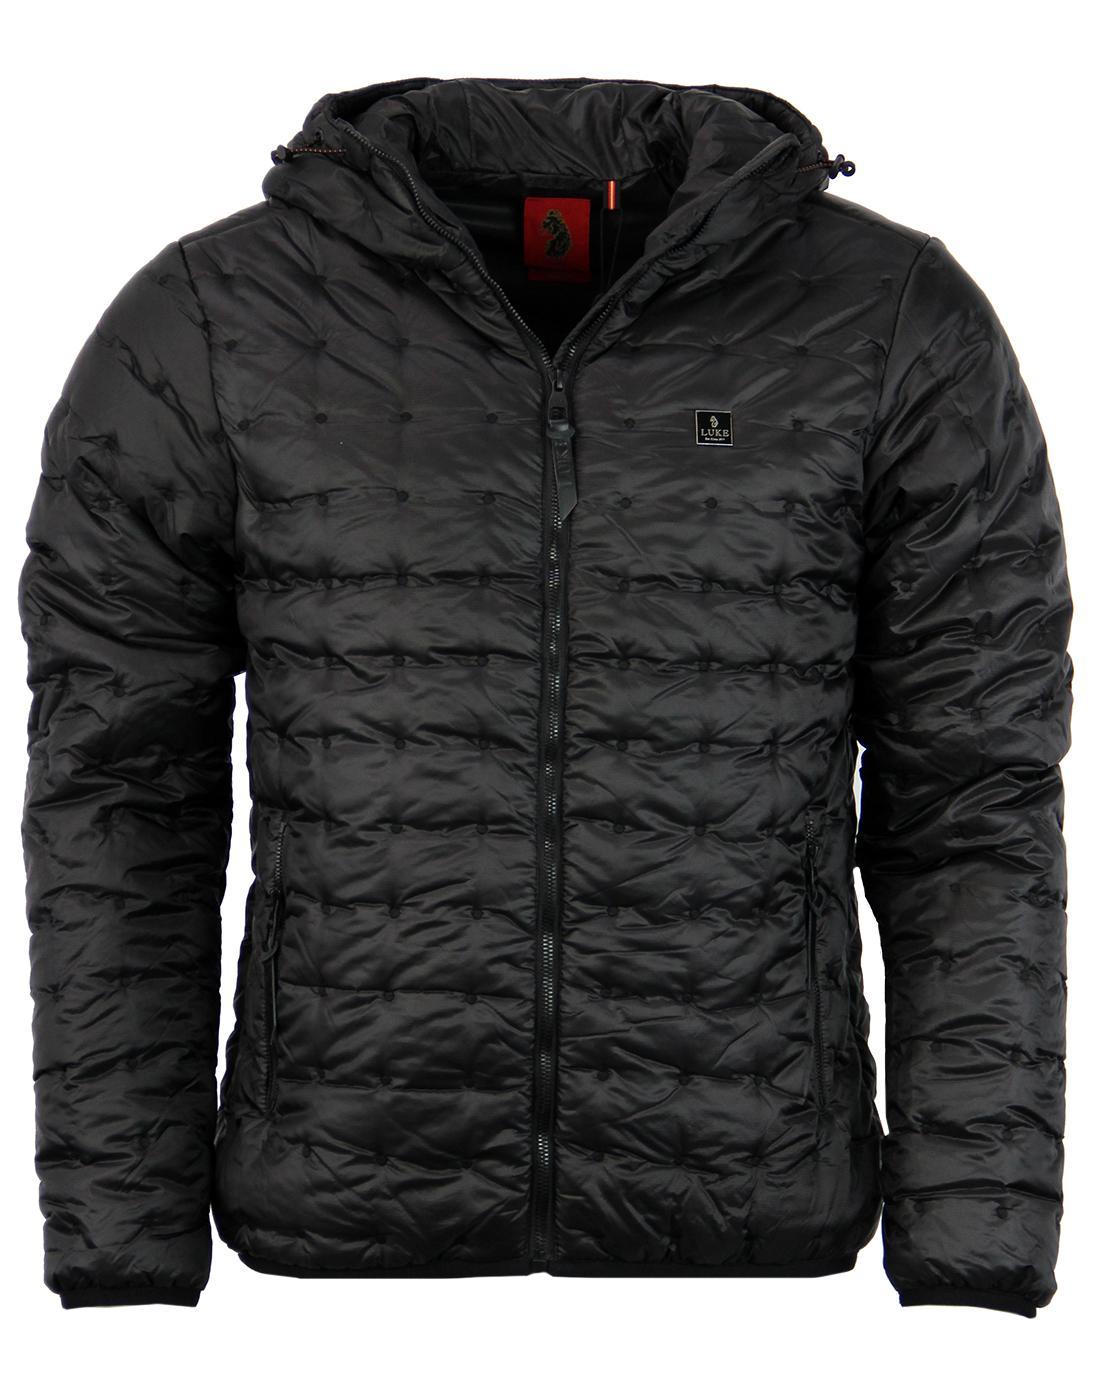 Paddie LUKE 1977 Retro Padded Ski Jacket in Black